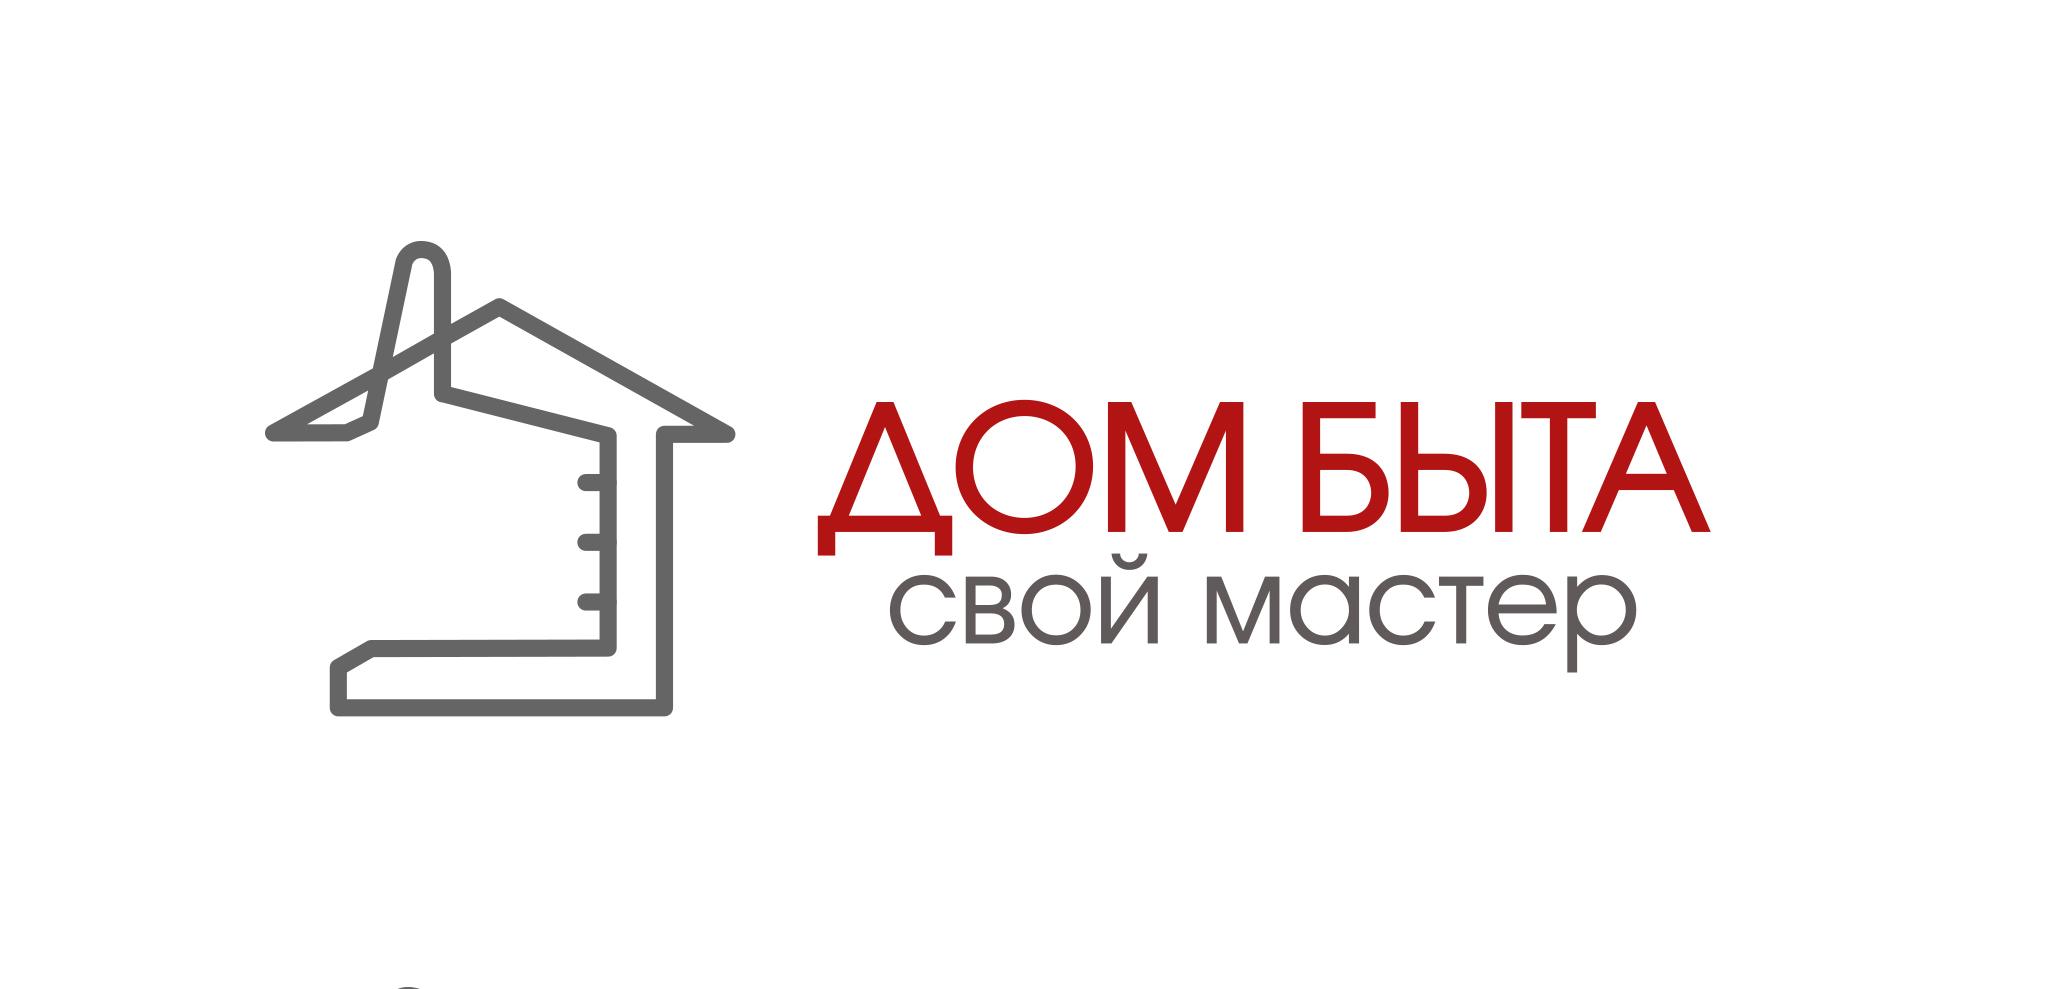 Логотип для сетевого ДОМ БЫТА фото f_8775d76a7dd7da57.jpg